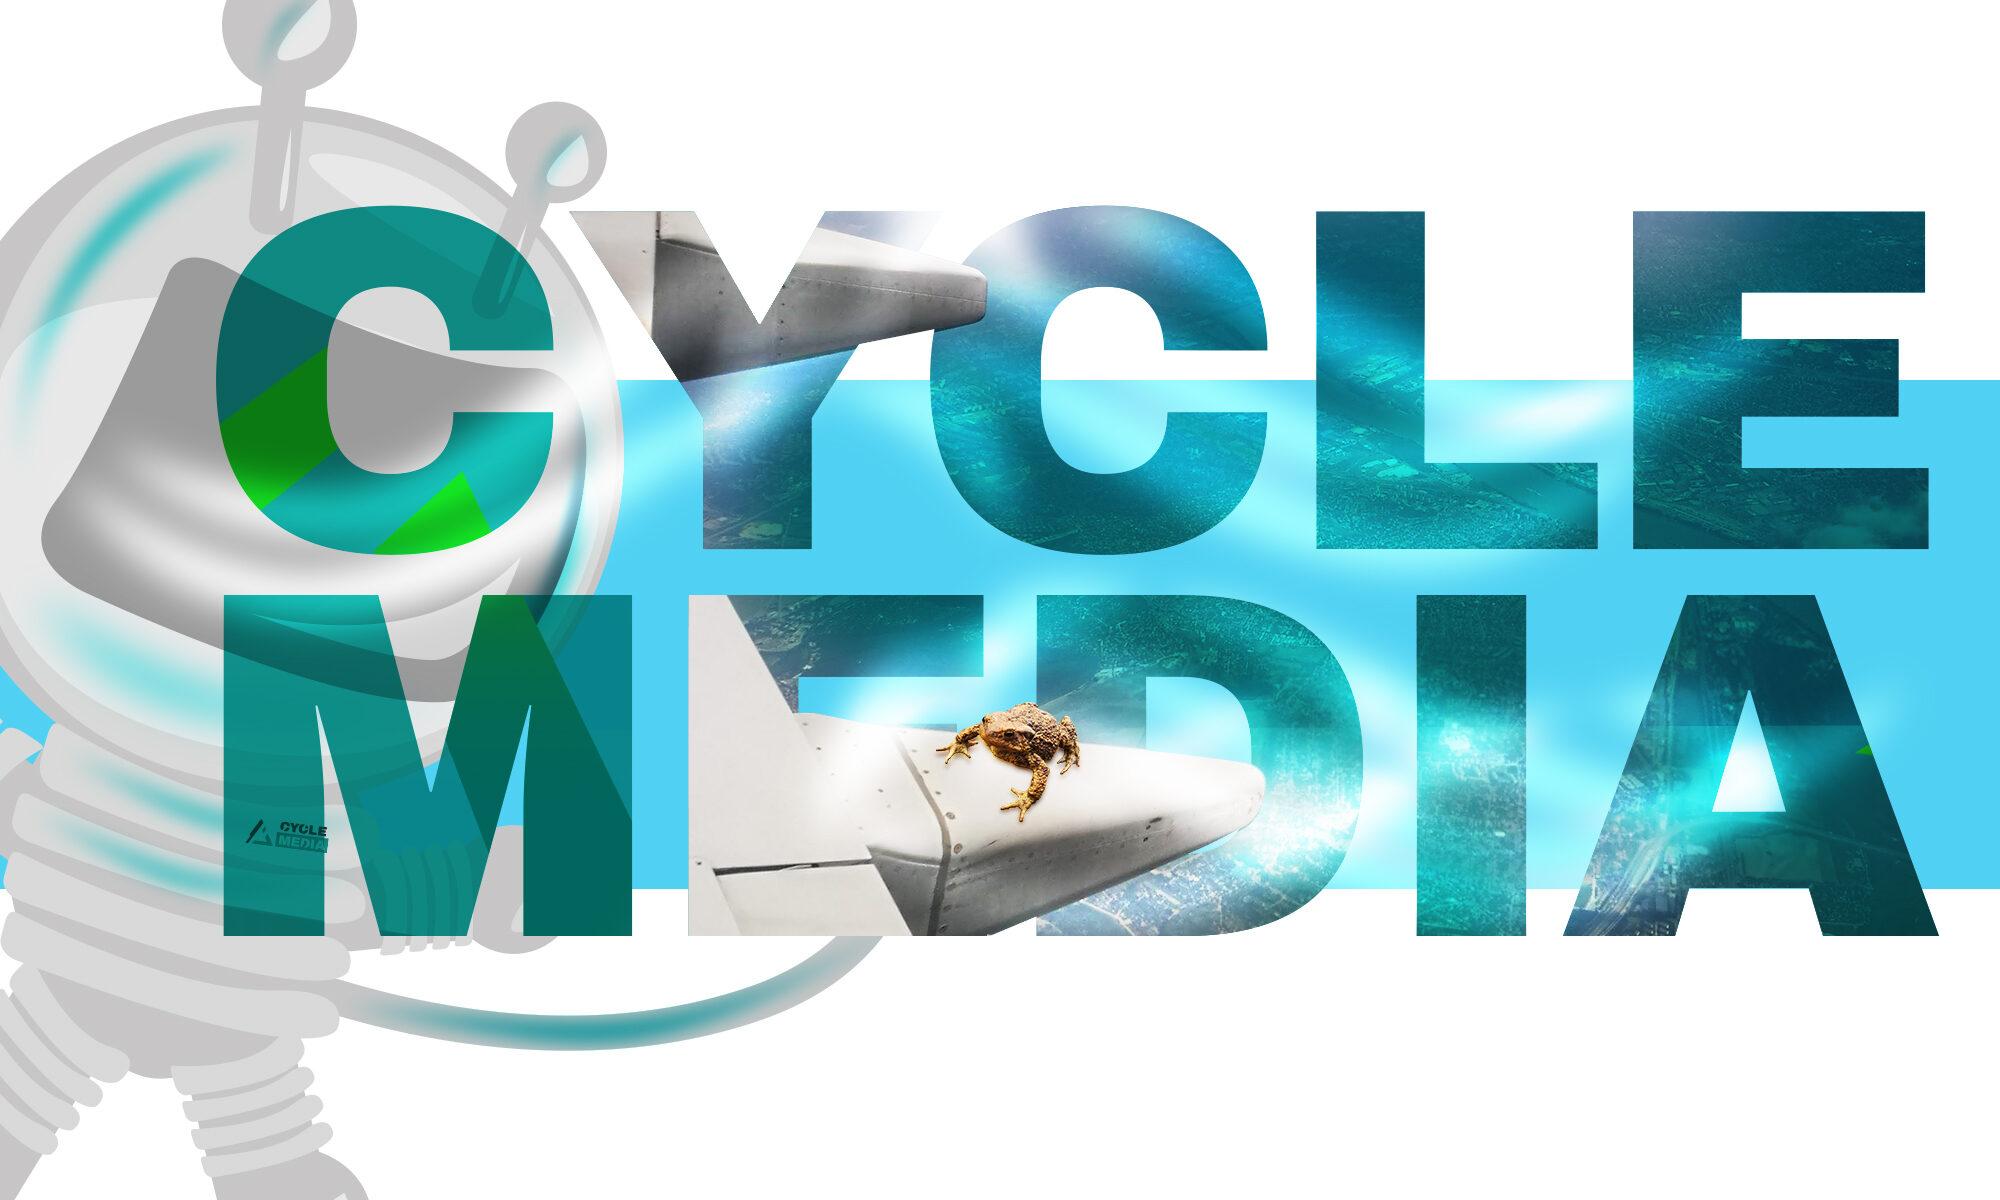 Cycle Media